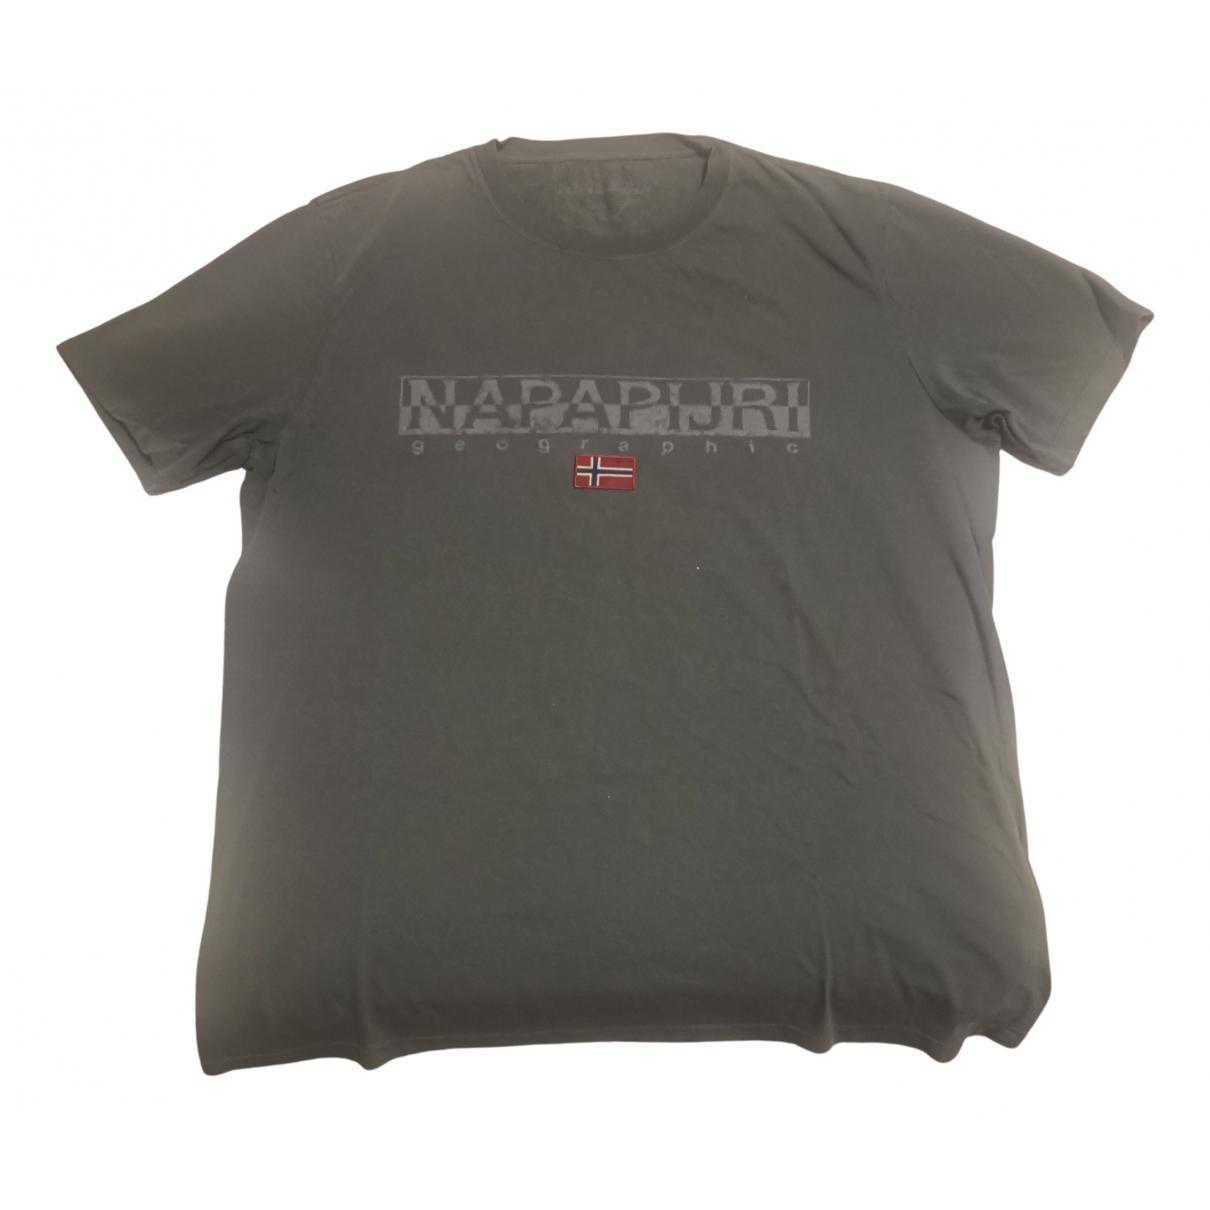 Napapijri - Tee shirts   pour homme en coton - kaki